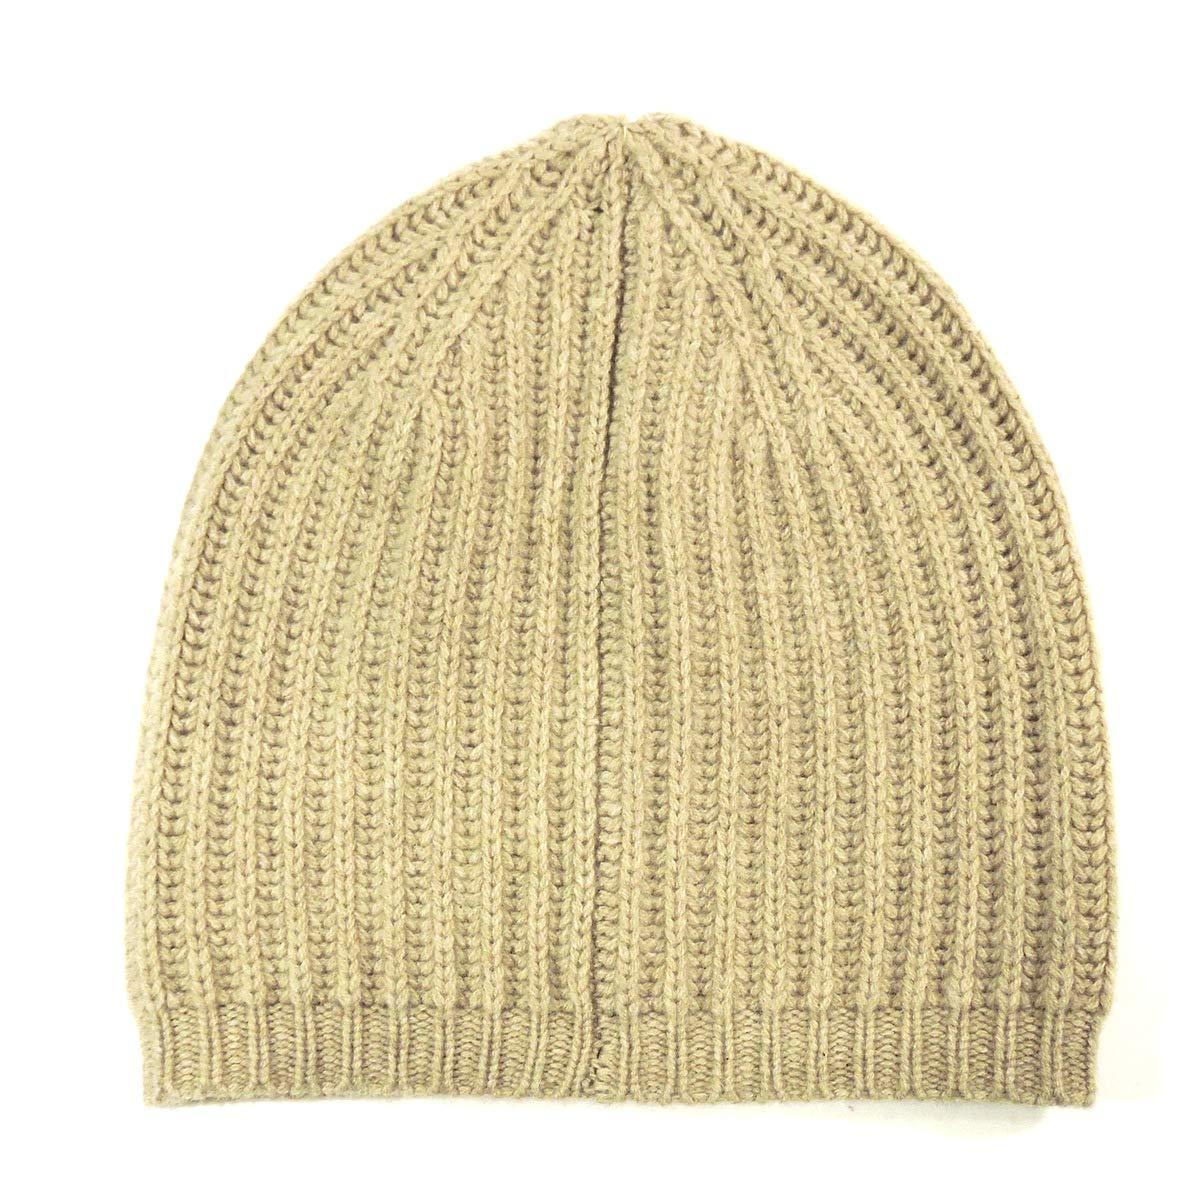 ⚜V.FRAAS⚜WOMEN'S COLD WEATHER BEIGE WINTER HEAD HAT